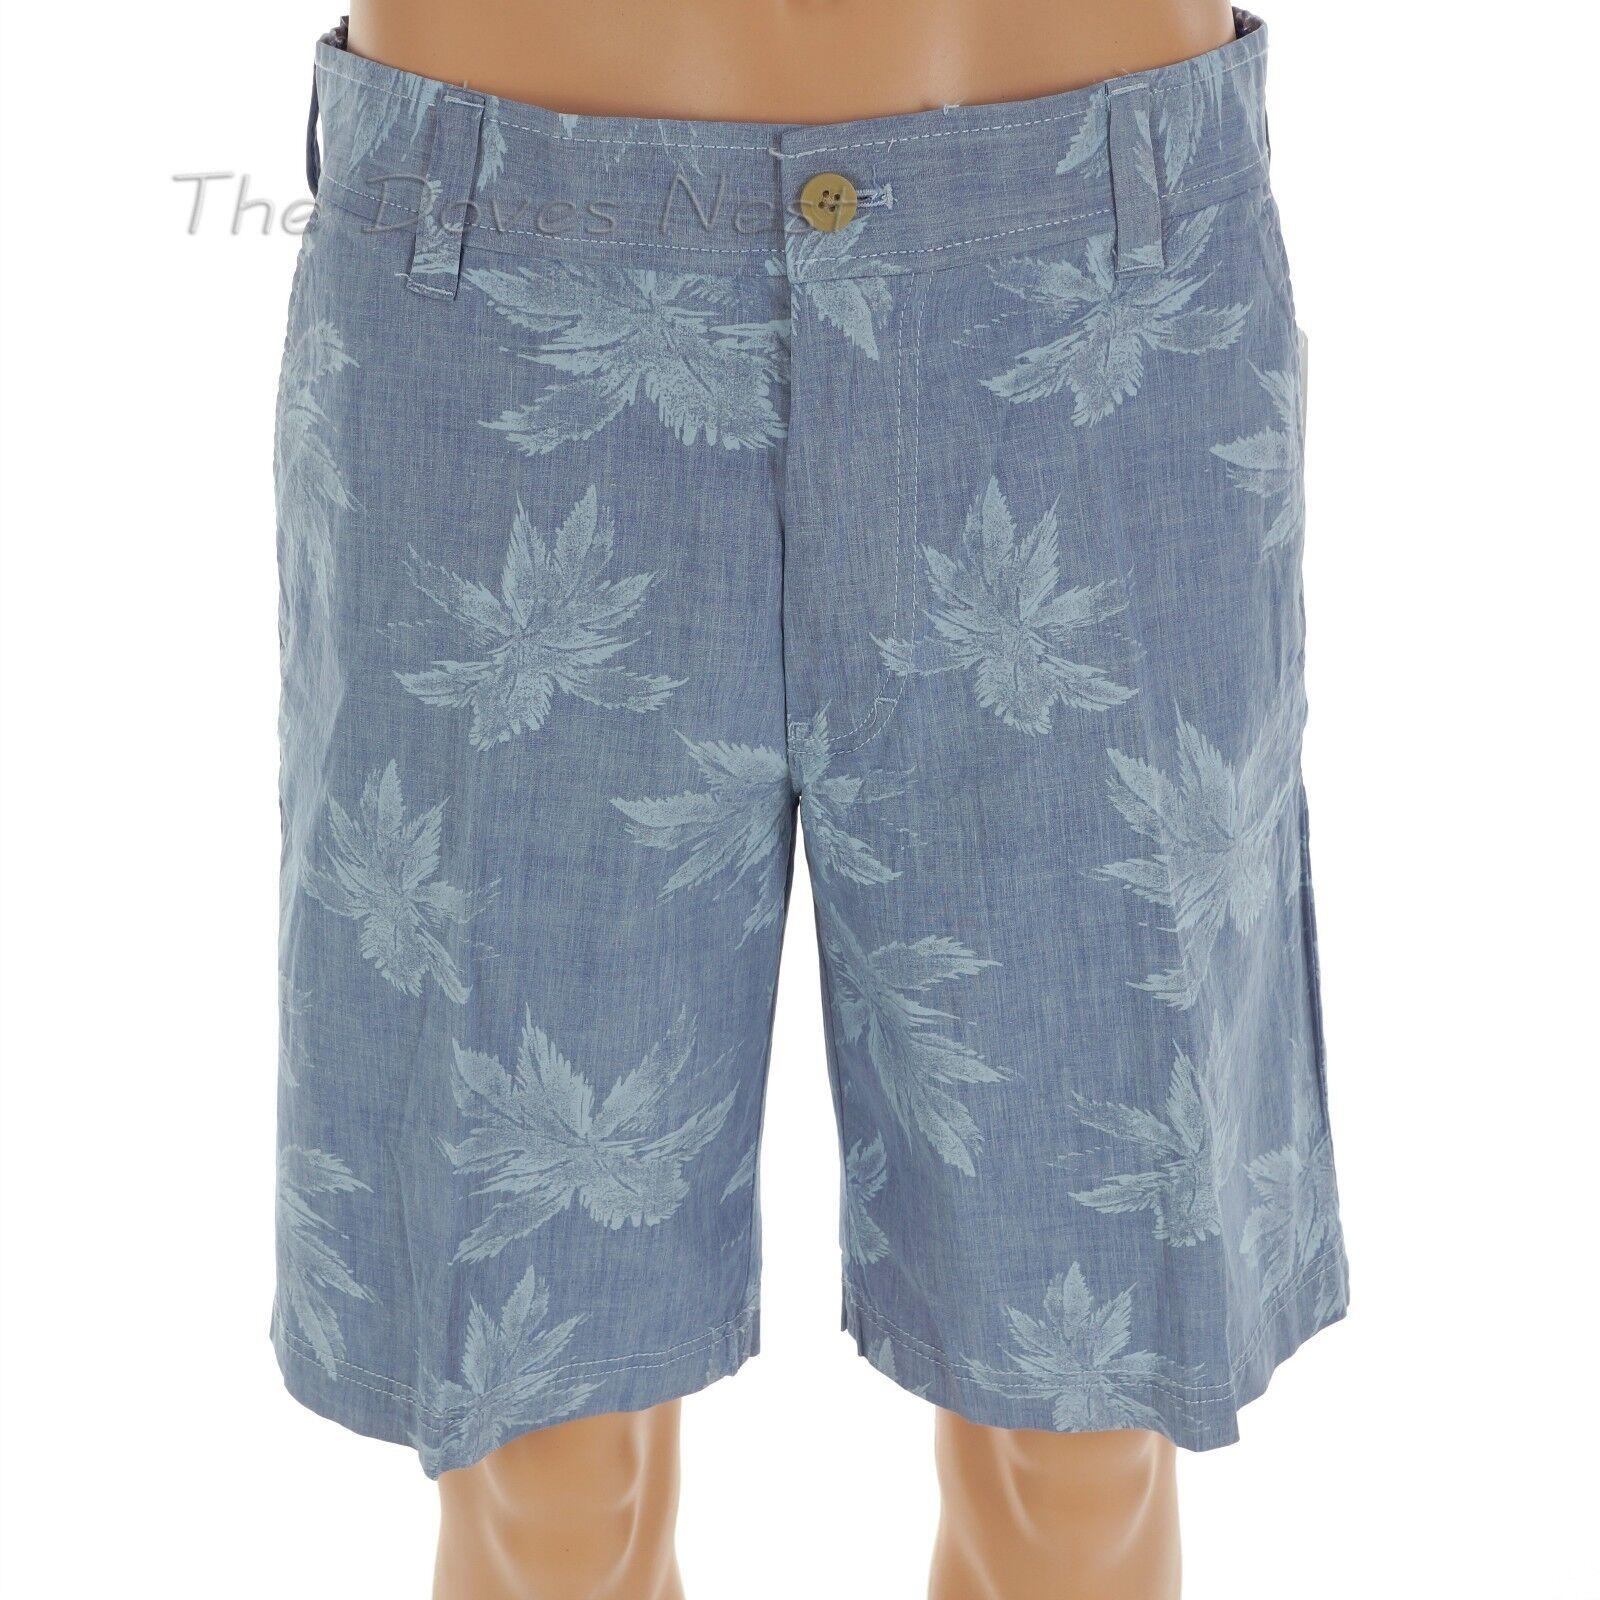 Club Blue 432 Size: LG Blue Izod Mens Palm Leaf Print Swim Trunk Short Large